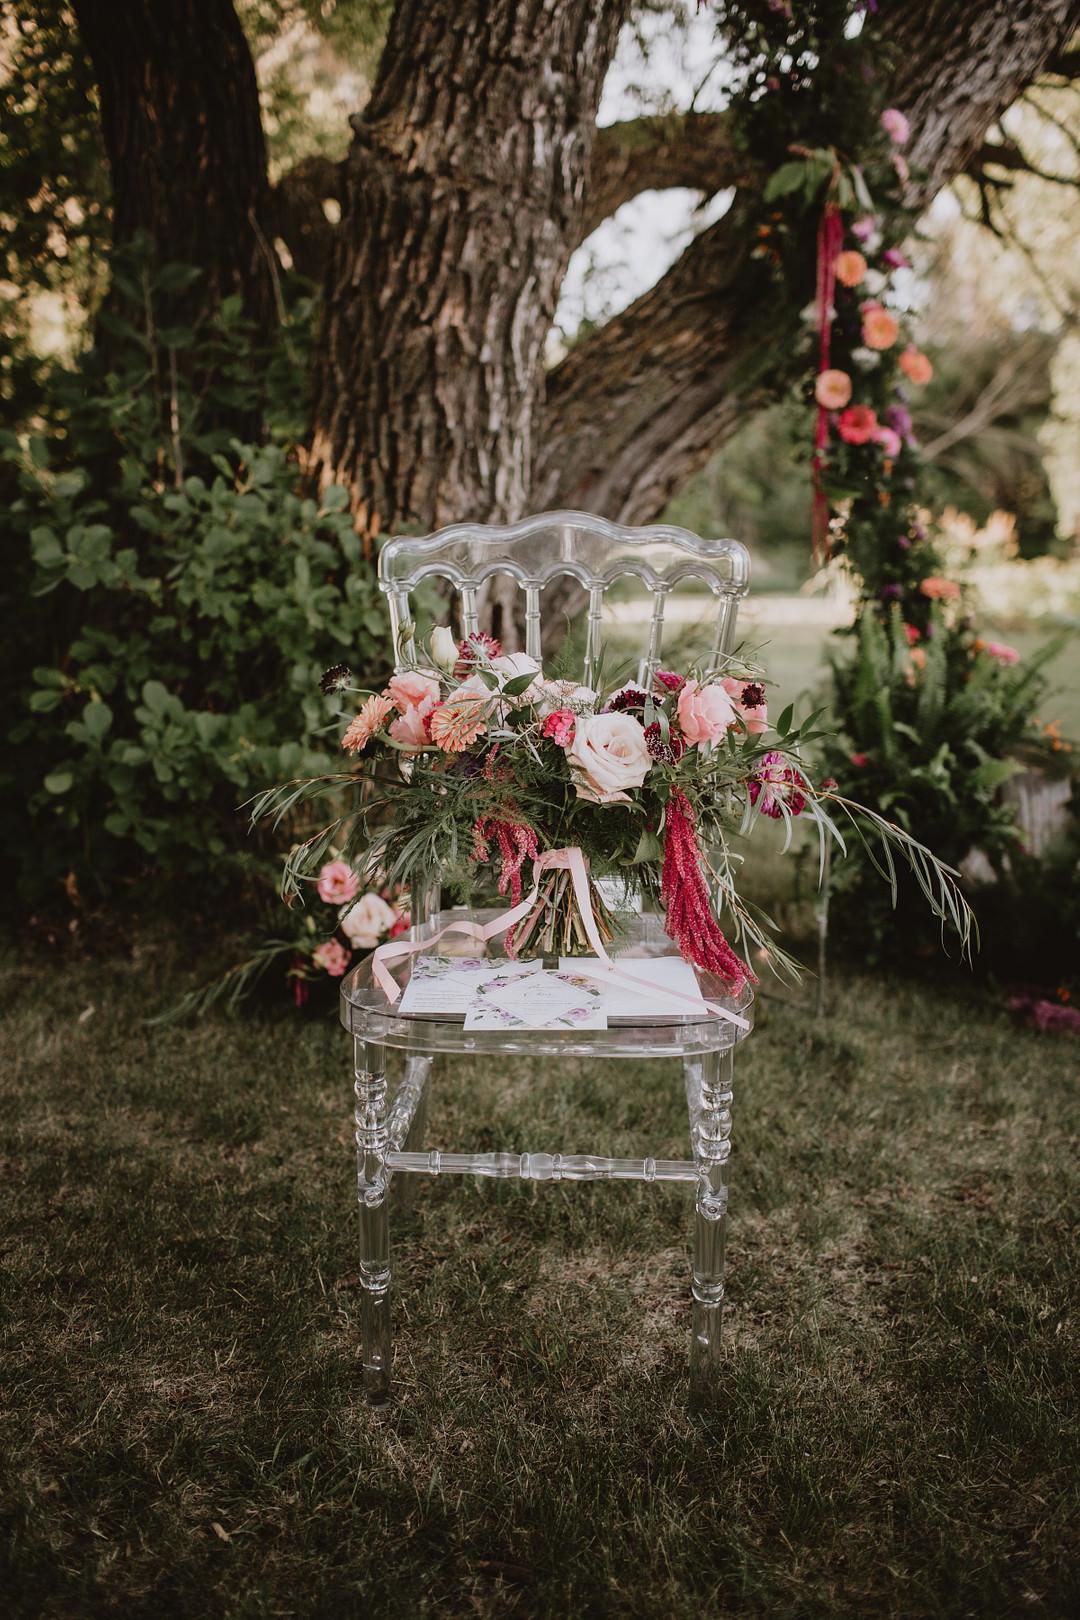 Ghost Chair Fairytale Forest Wedding Christina W Kroeker Creative